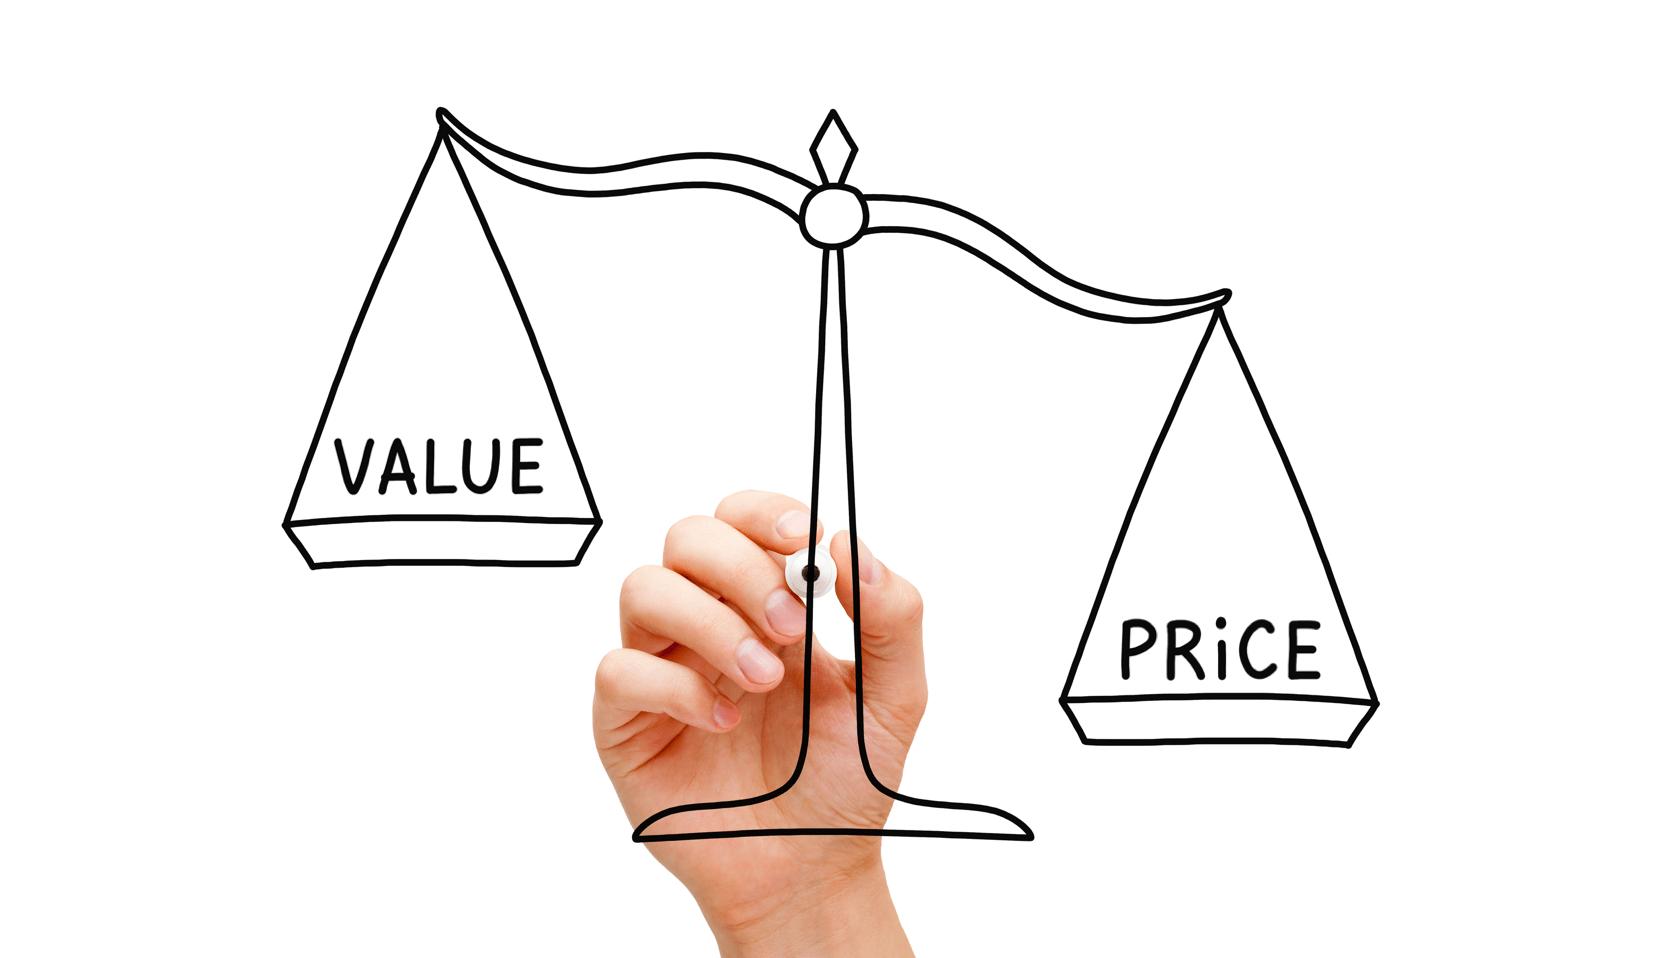 Price Image Metric